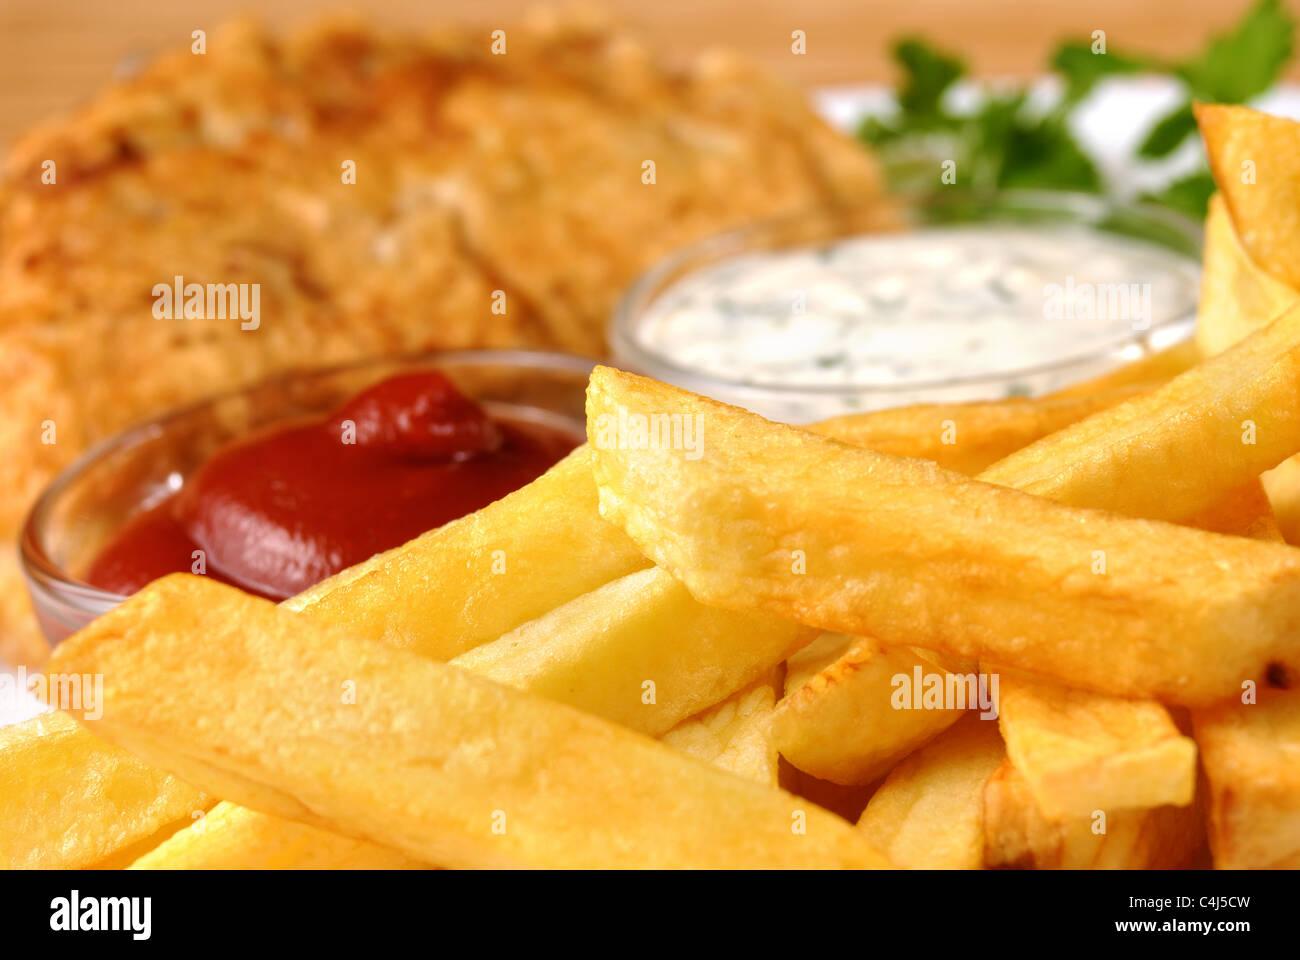 Piastra bianca con pesce e patatine, mayo e ketchup Foto Stock